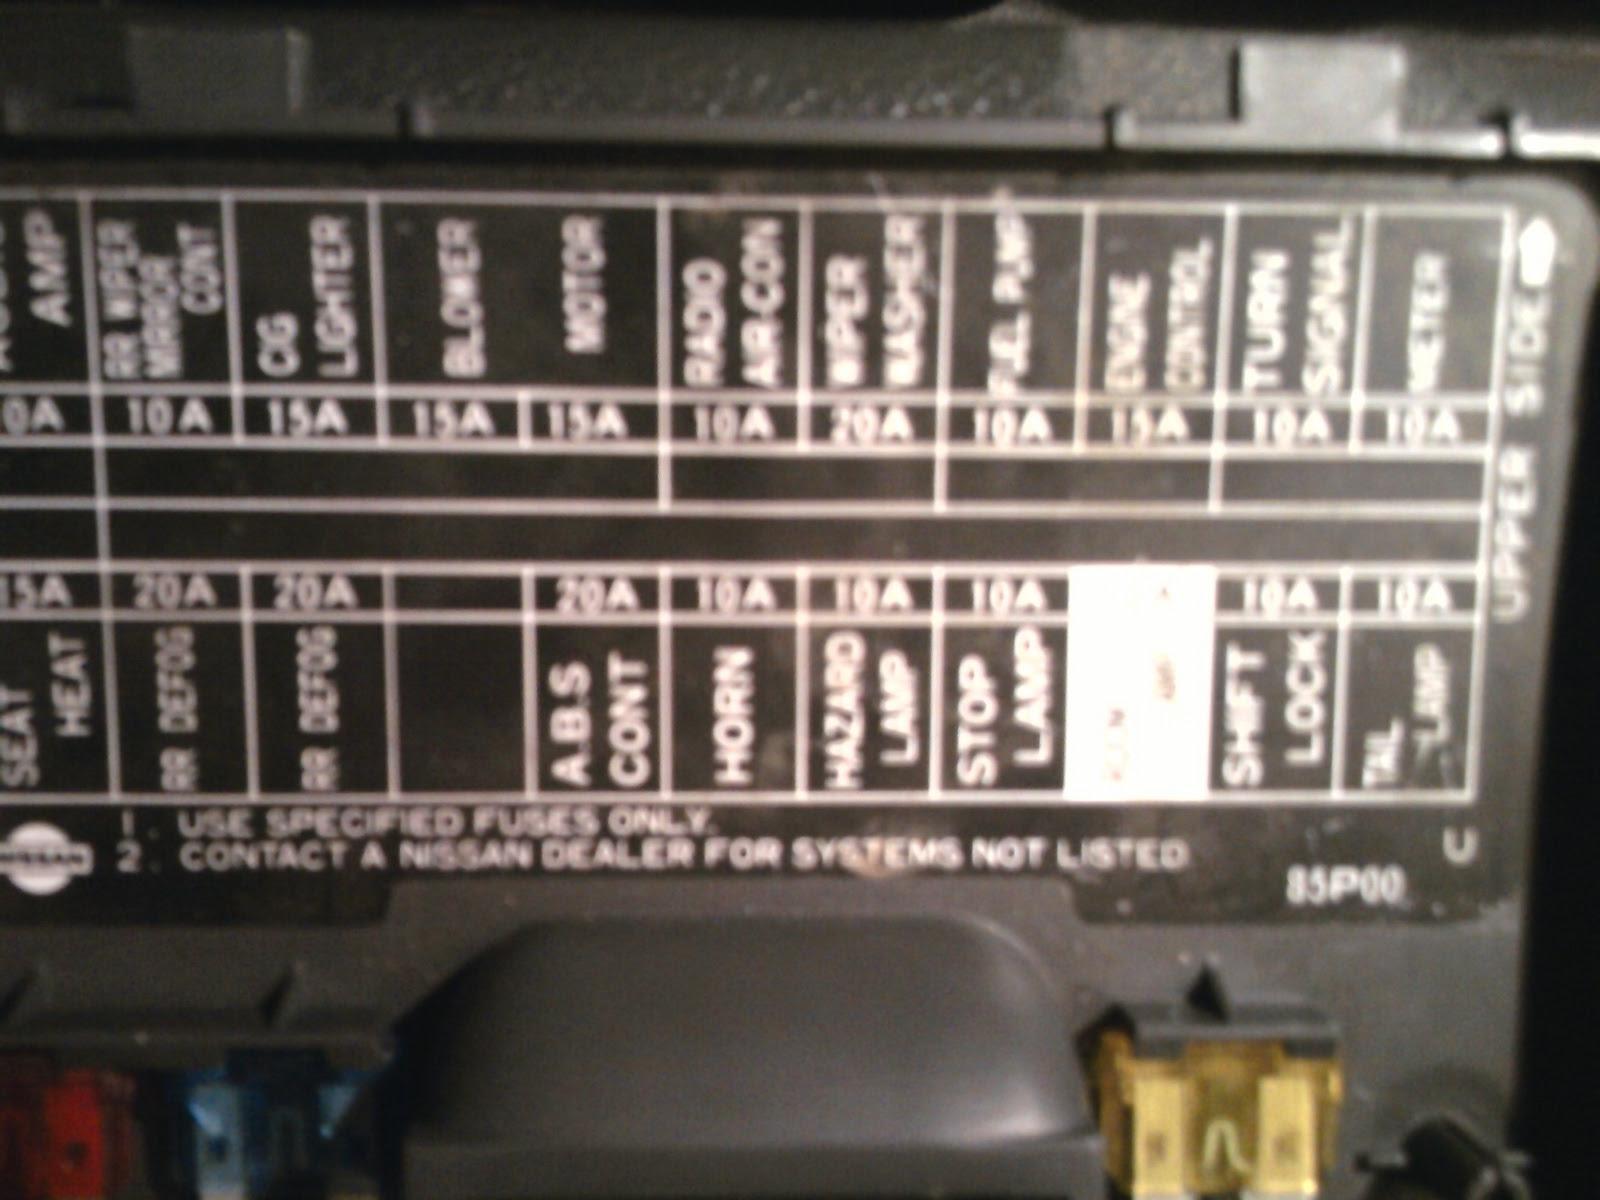 1986 Nissan Maxima Fuse Box Diagram Wiring Diagram Ultimate2 Ultimate2 Musikami It